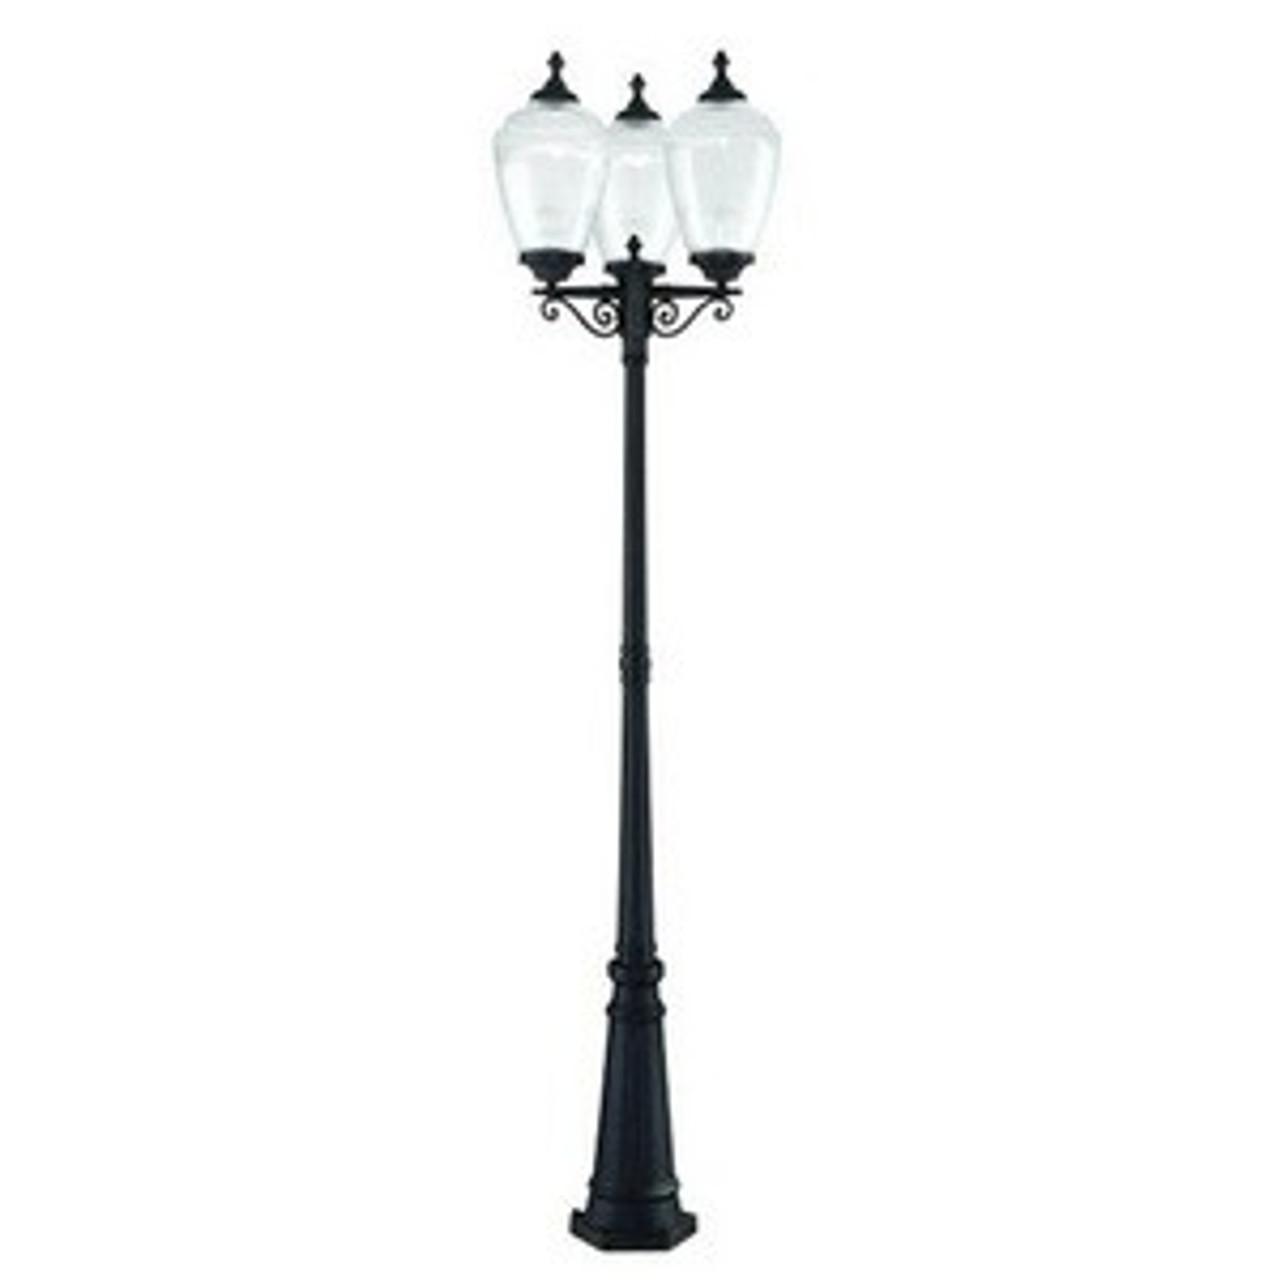 Acorn Three Light Post Lantern by Acclaim Lighting, Matte BlackFinish with Clear Prismatic Acrylic Glass, 120V, 60W each bulb, UL Listed (5369BK-CL)